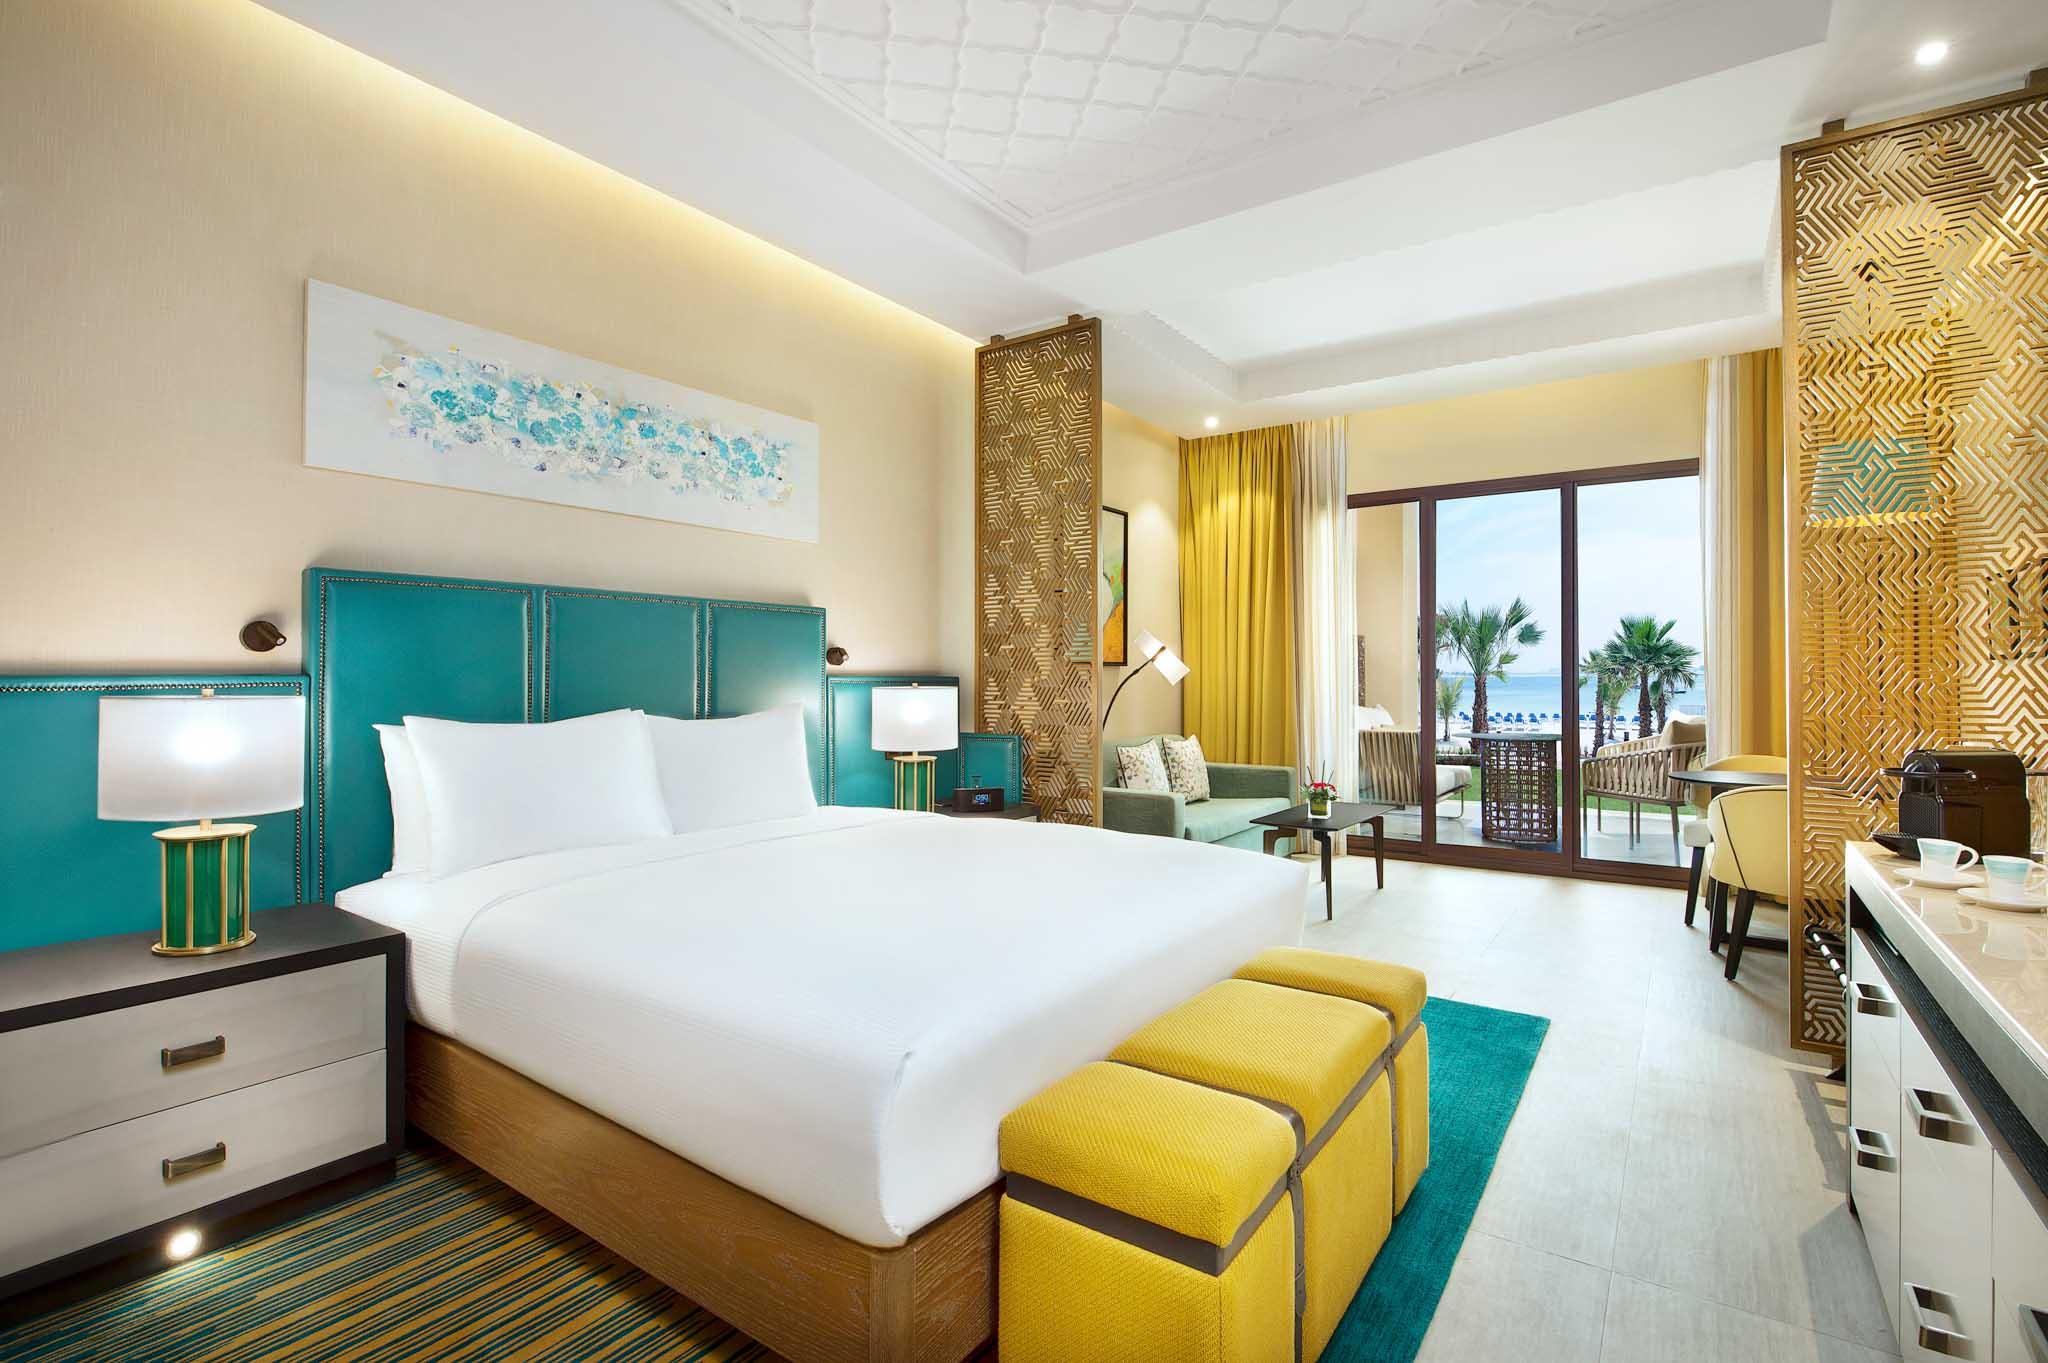 Hotel Photographer - Doubletree By Hilton Luxury Bedroom